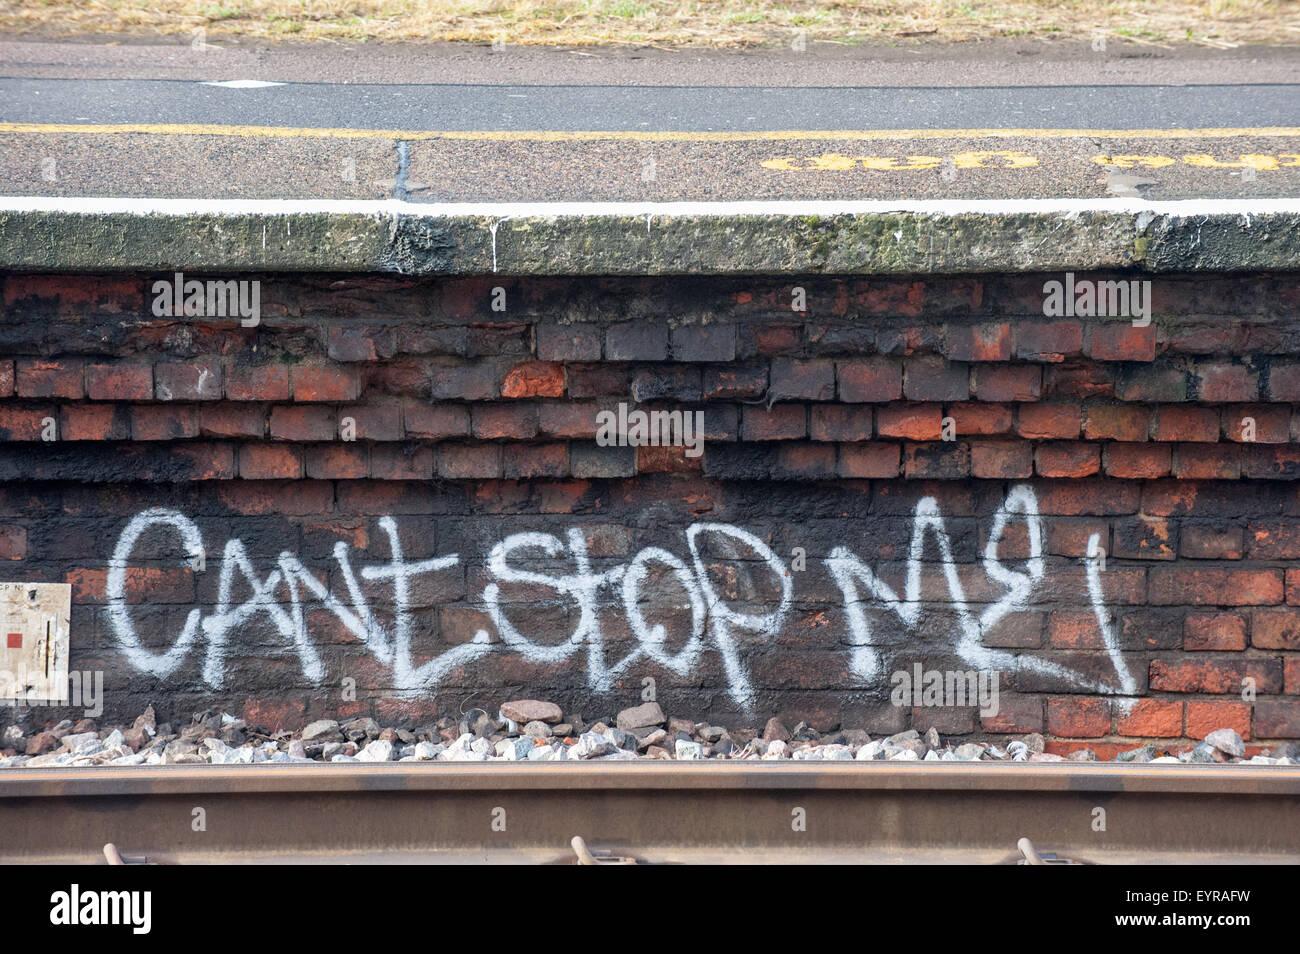 Norbiton station, Surrey. Graffitti 'Can't stop me' under the platform. - Stock Image